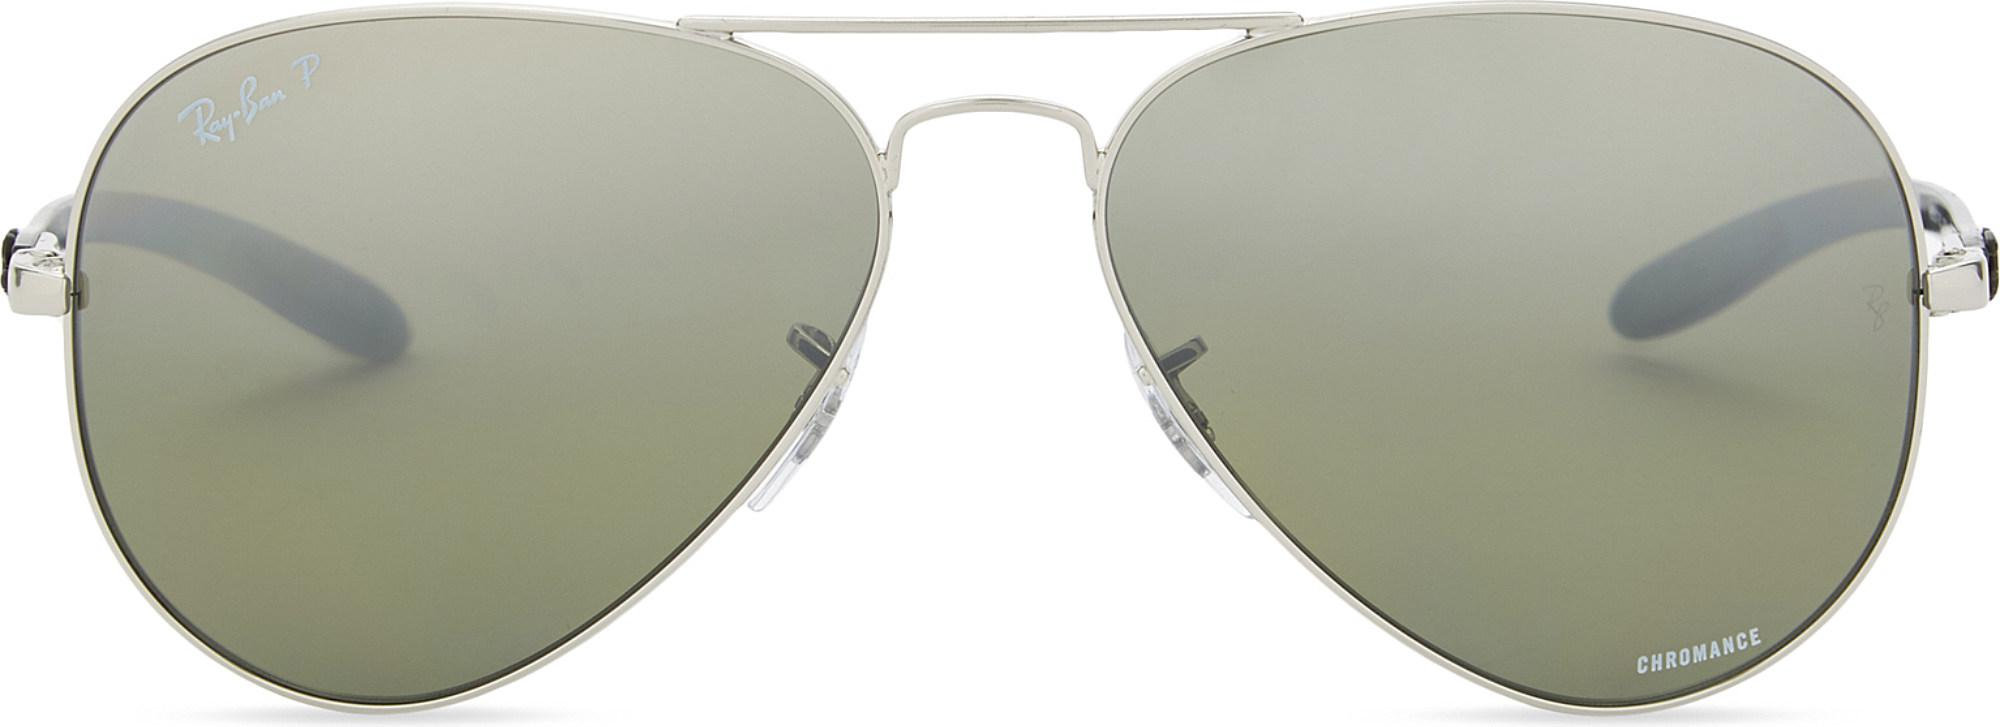 4187e954acf2a Ray-Ban Rb8317ch Chromance® Aviator Sunglasses in Metallic for Men ...